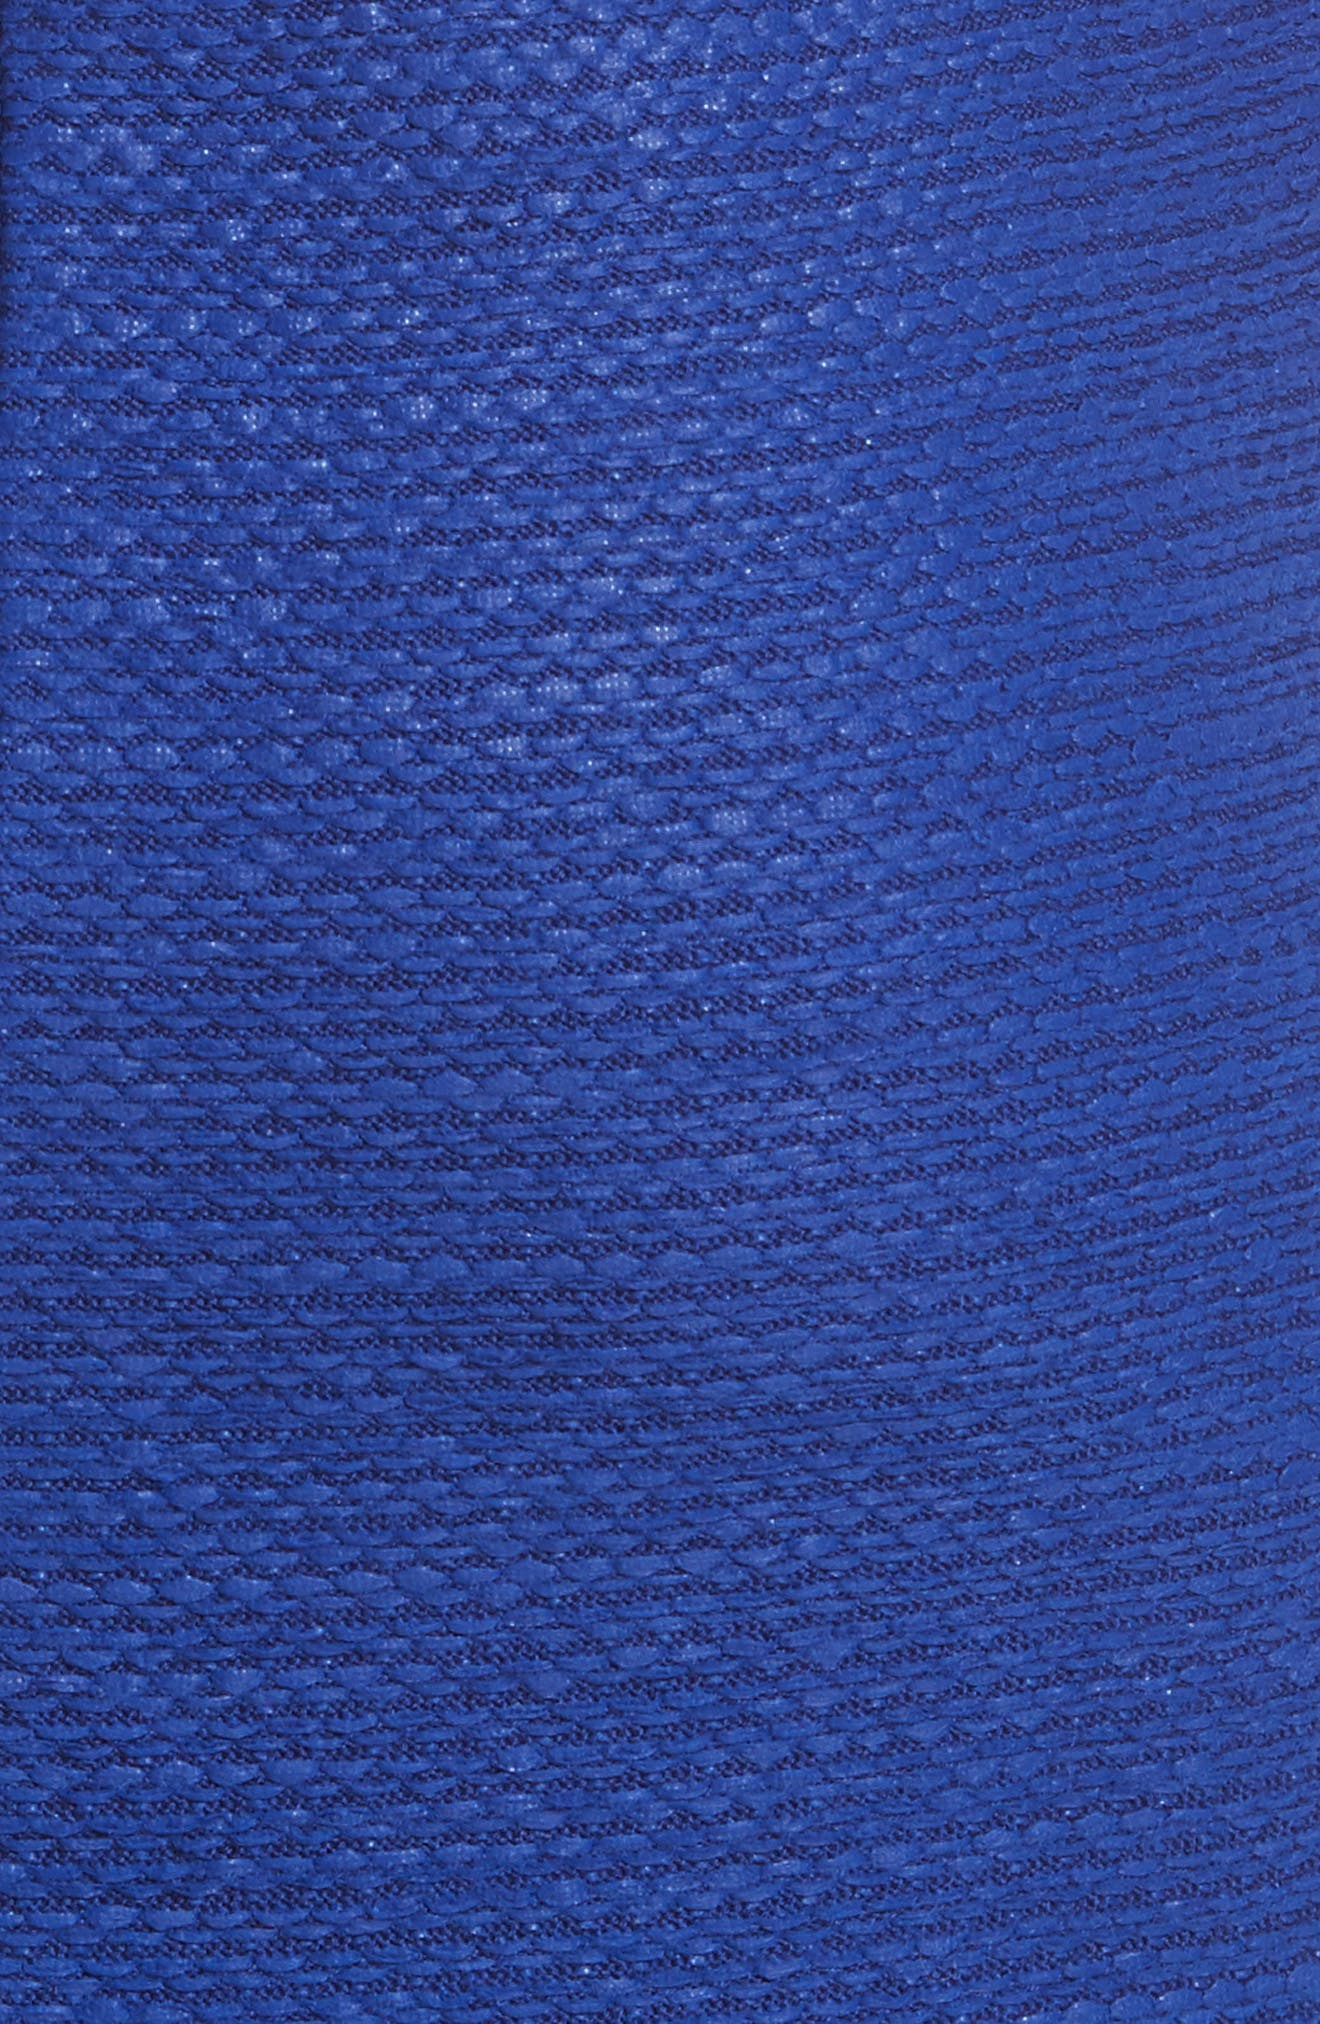 Sheen Tape Knit Tie Neck Dress,                             Alternate thumbnail 5, color,                             430